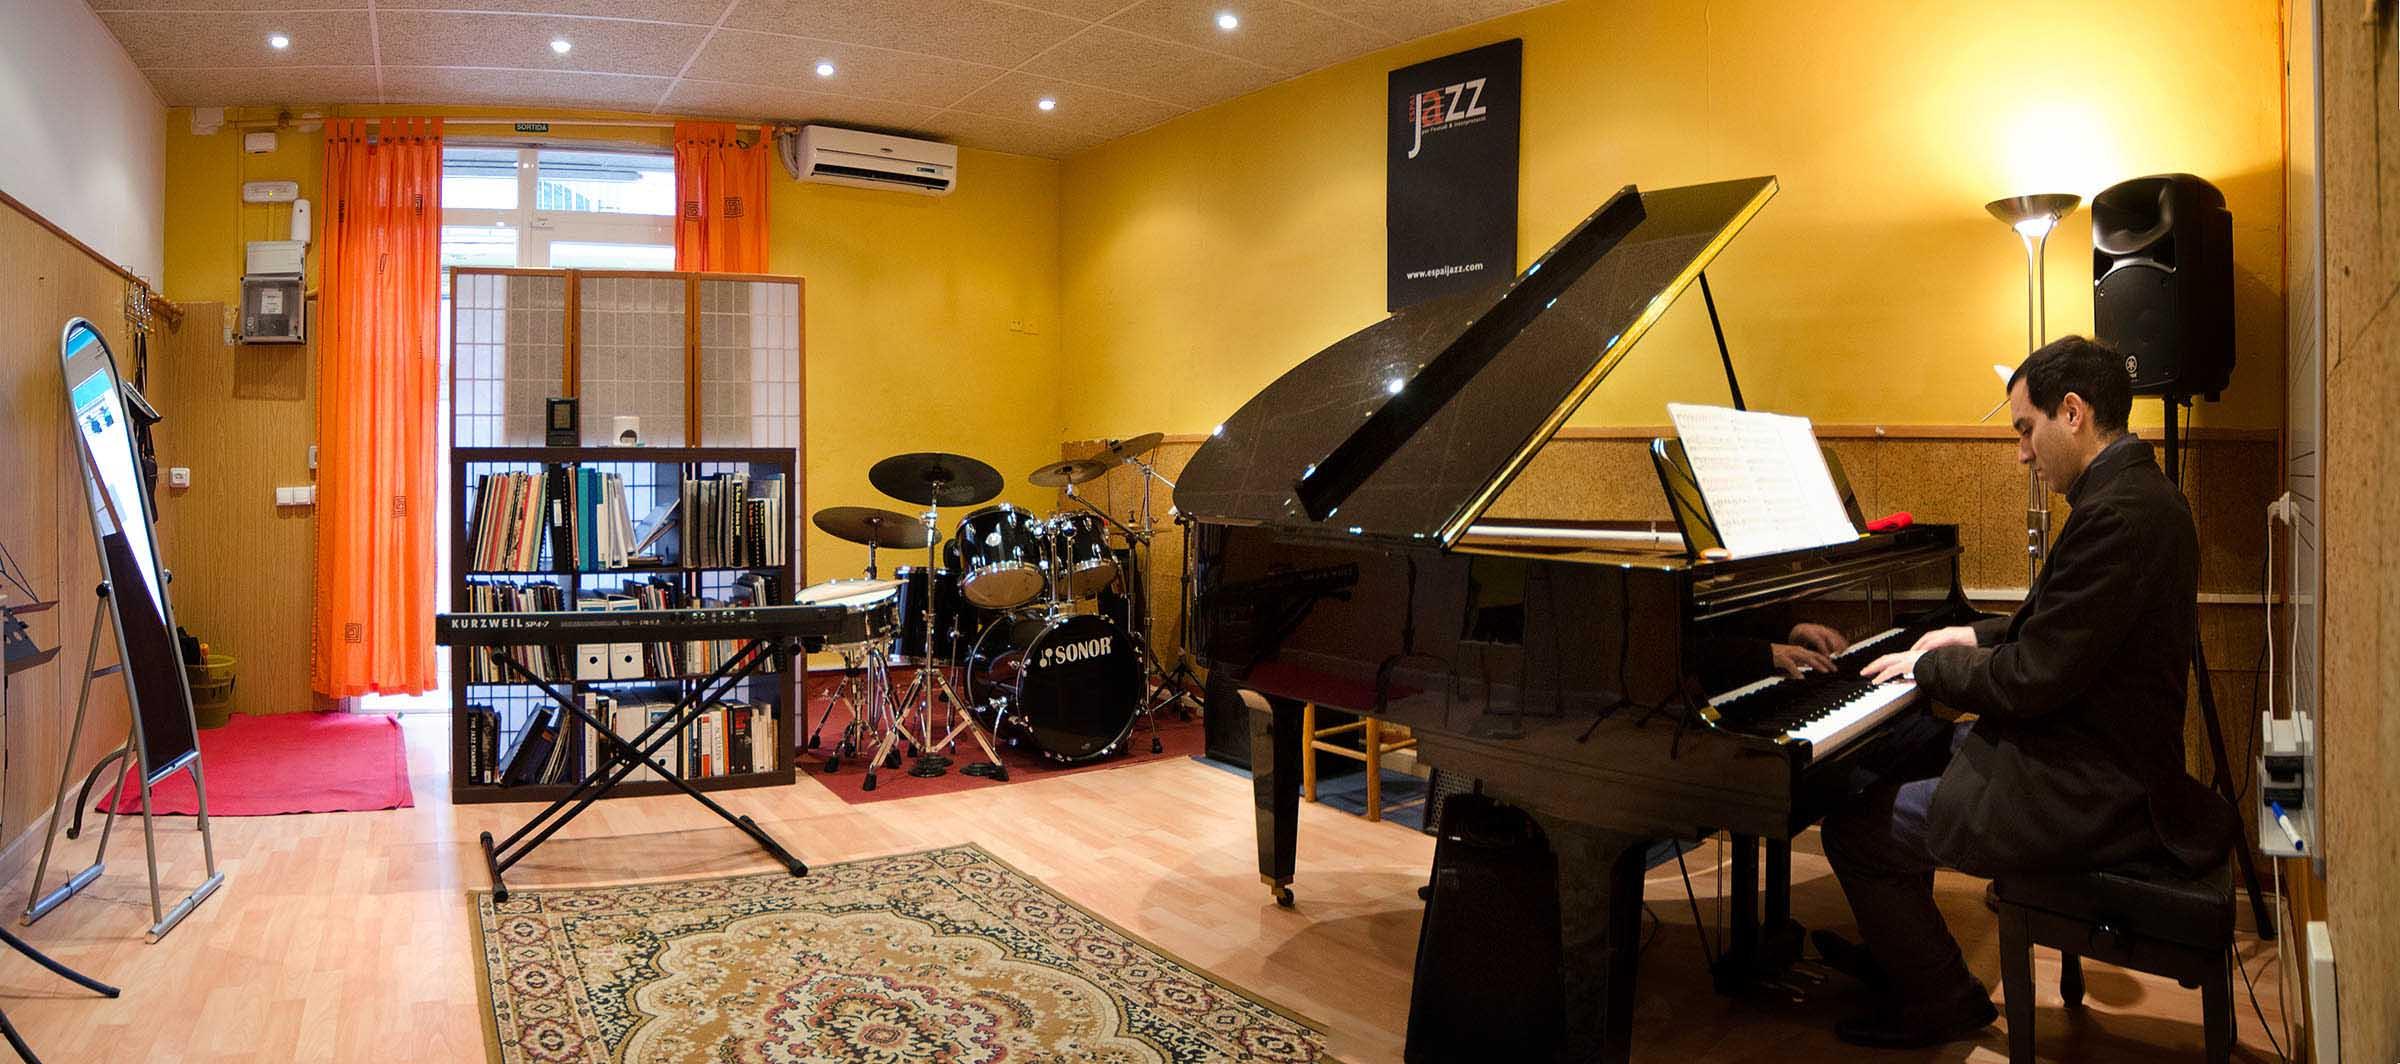 Espia Jazz. Escola de música. Jazz Academy. Girona. Salt. Bescanó